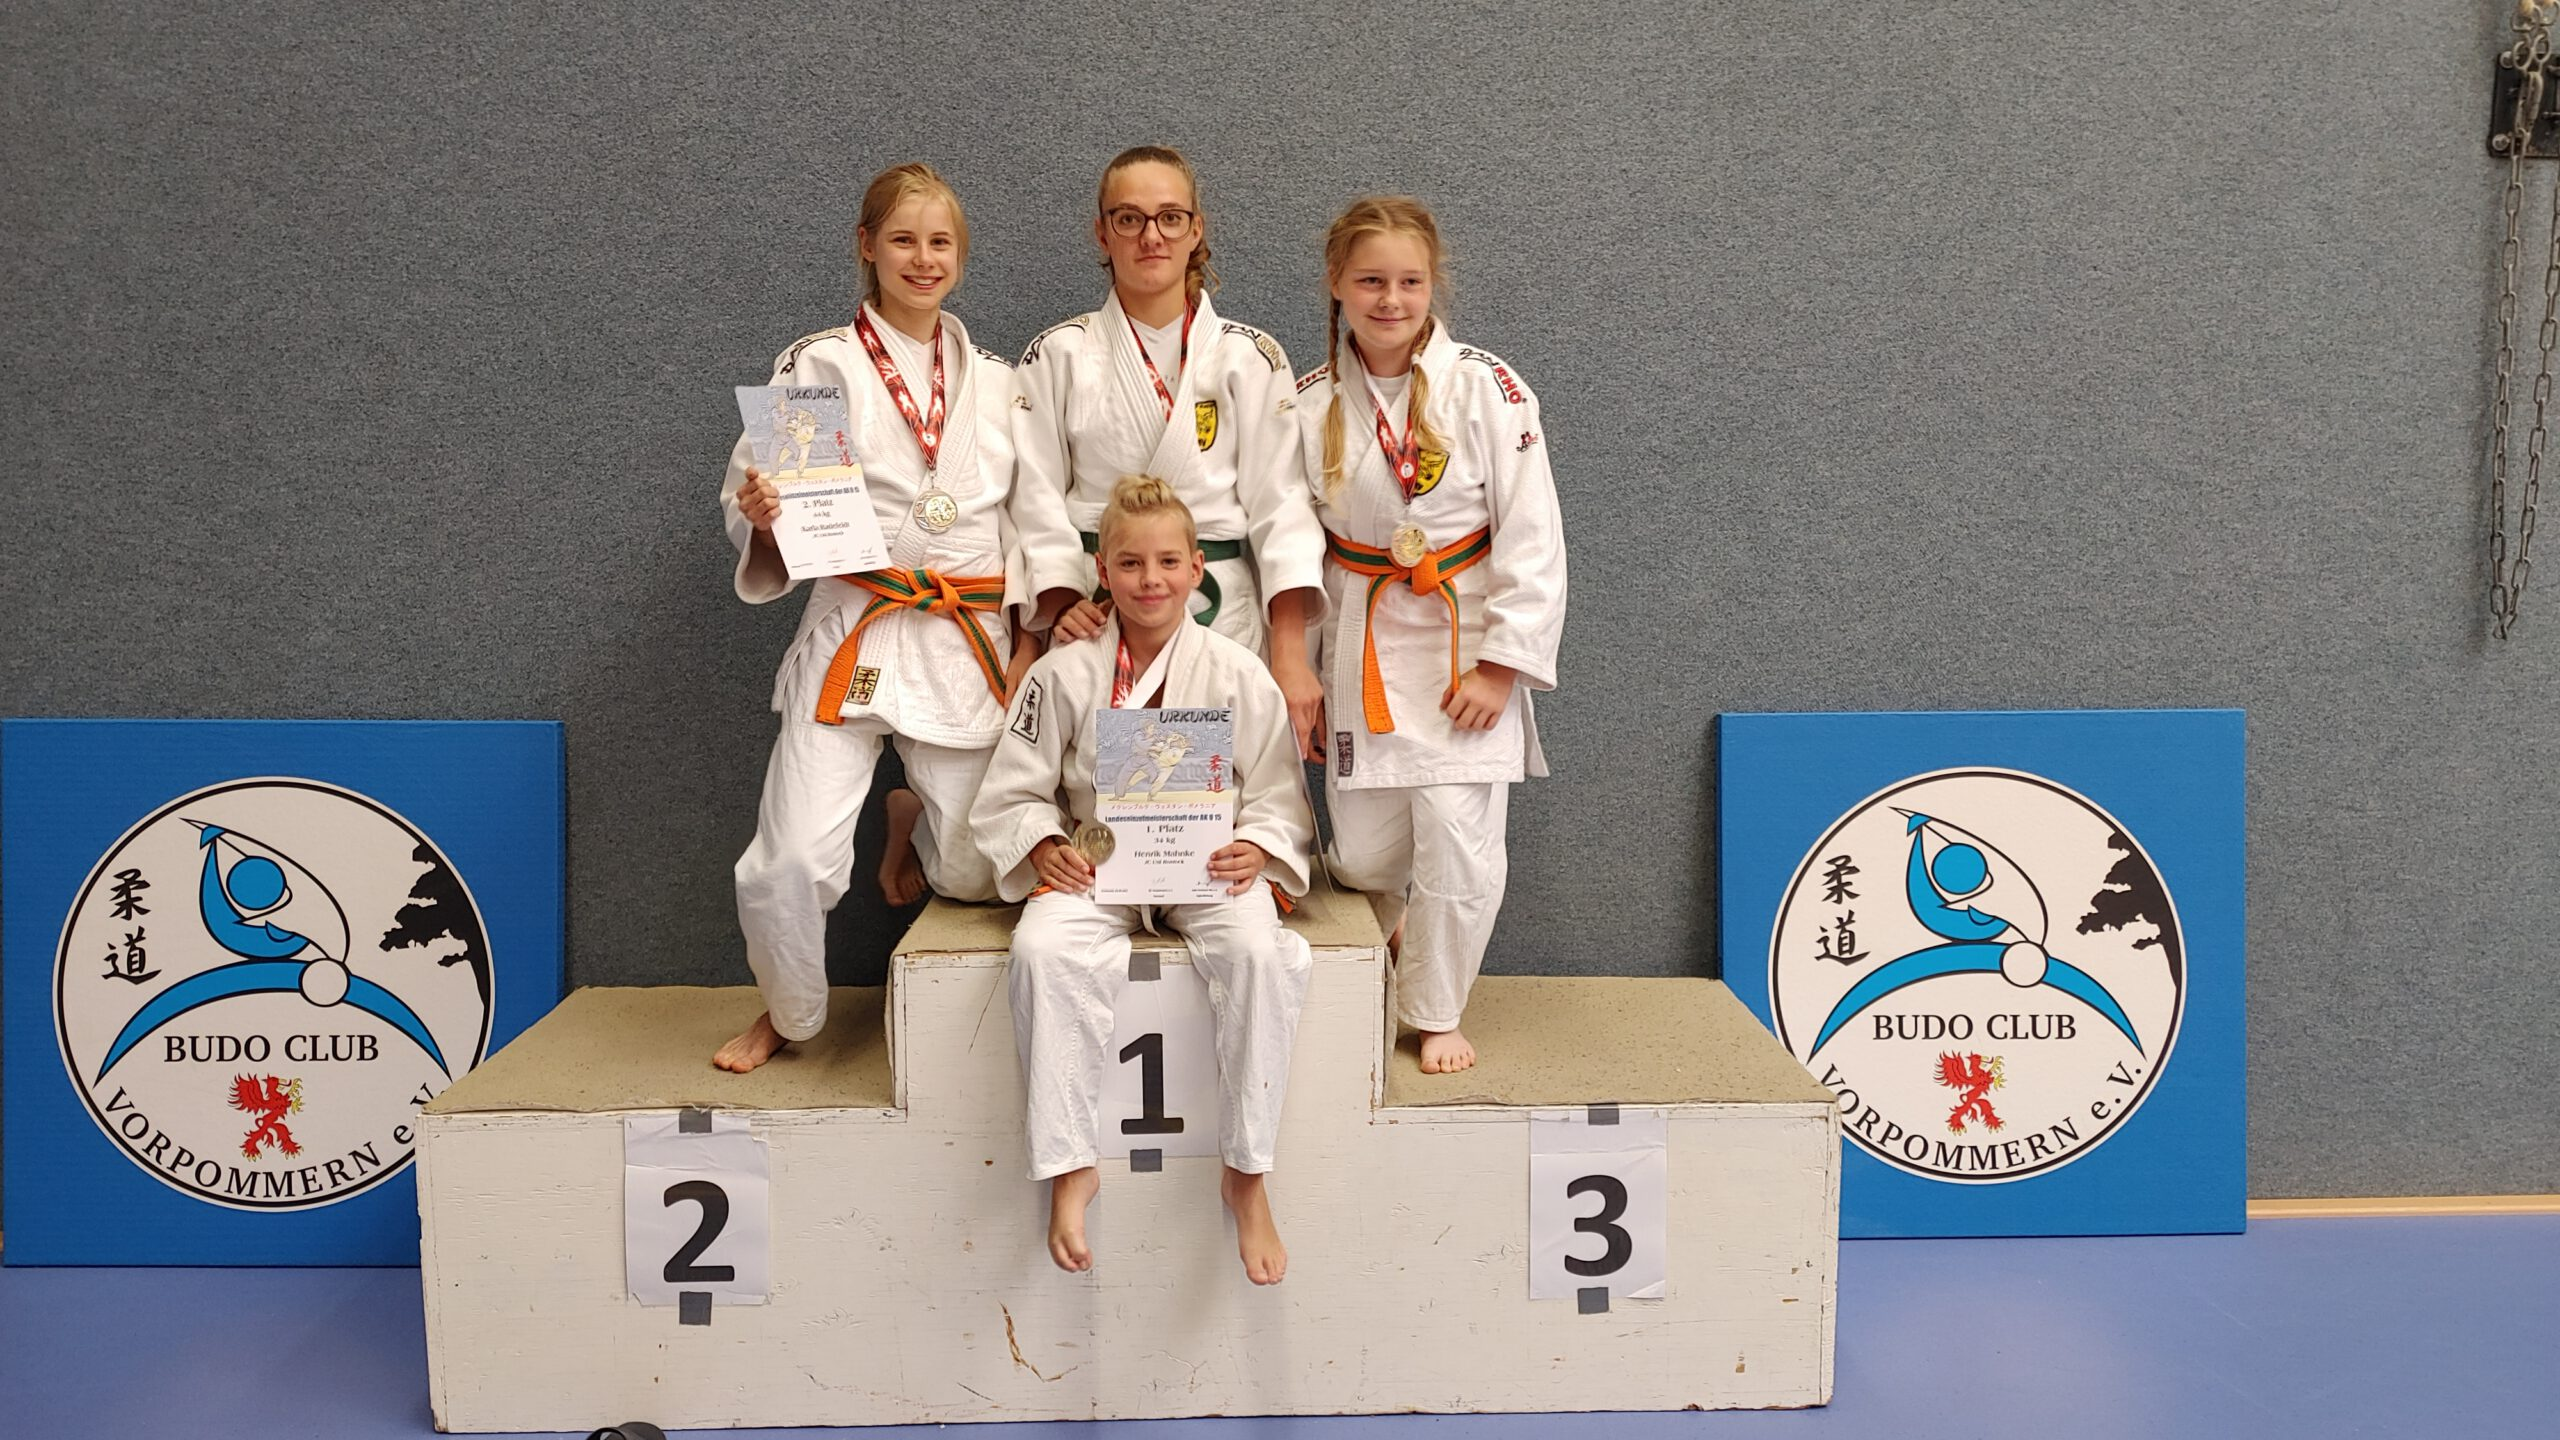 LEM U15 Greifswald 2021 Siegerehrung 5 Judogreifen - Judo Rostock